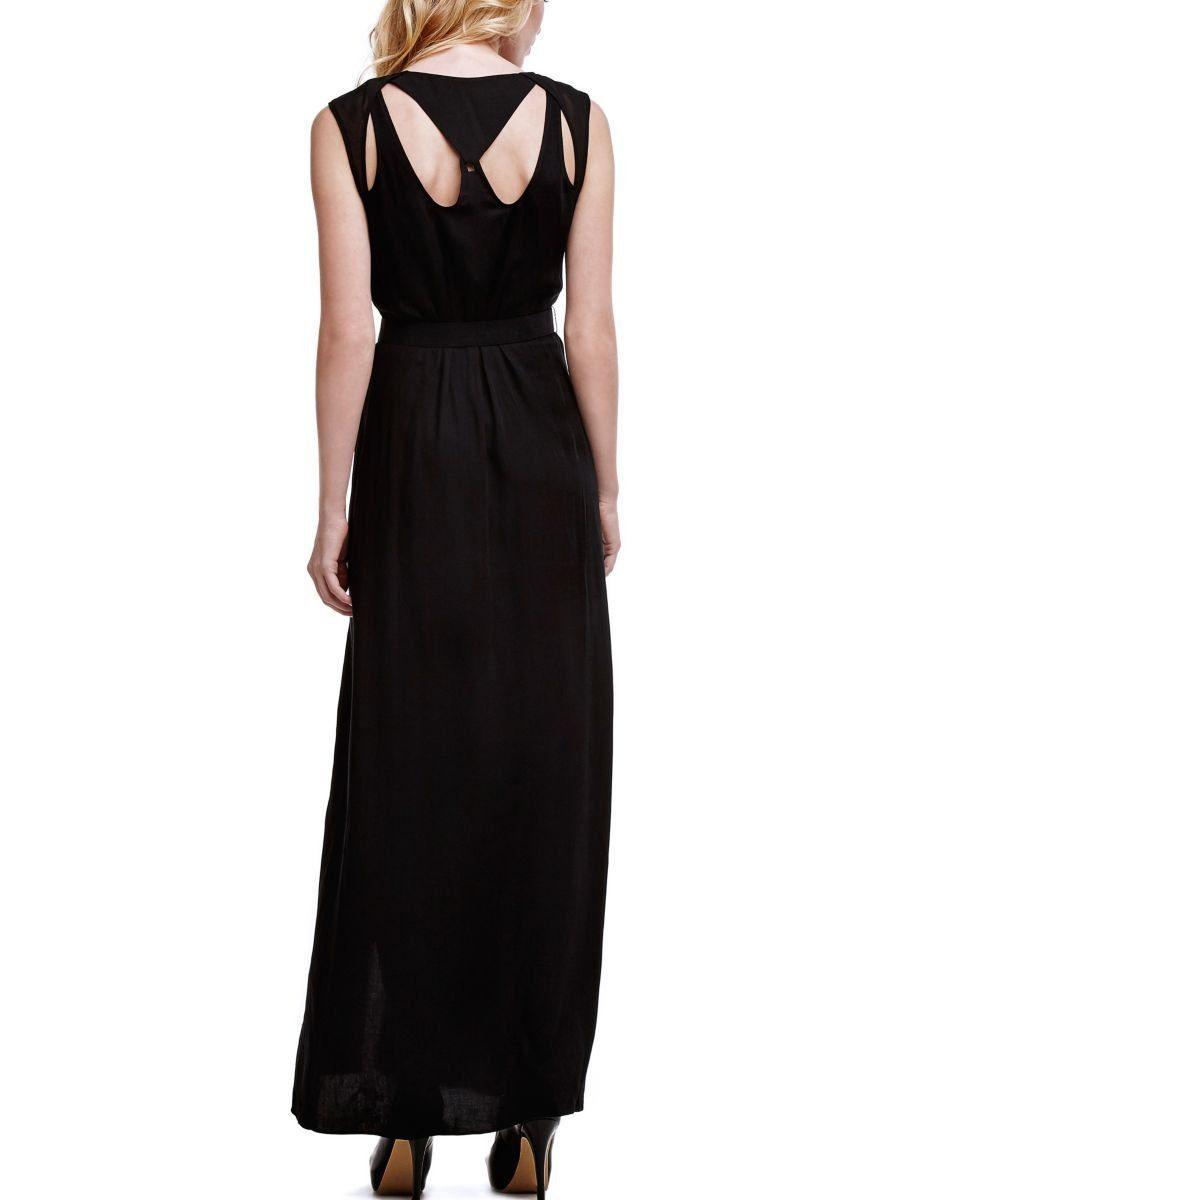 13 Elegant Guess Abend Kleid Design Genial Guess Abend Kleid Stylish